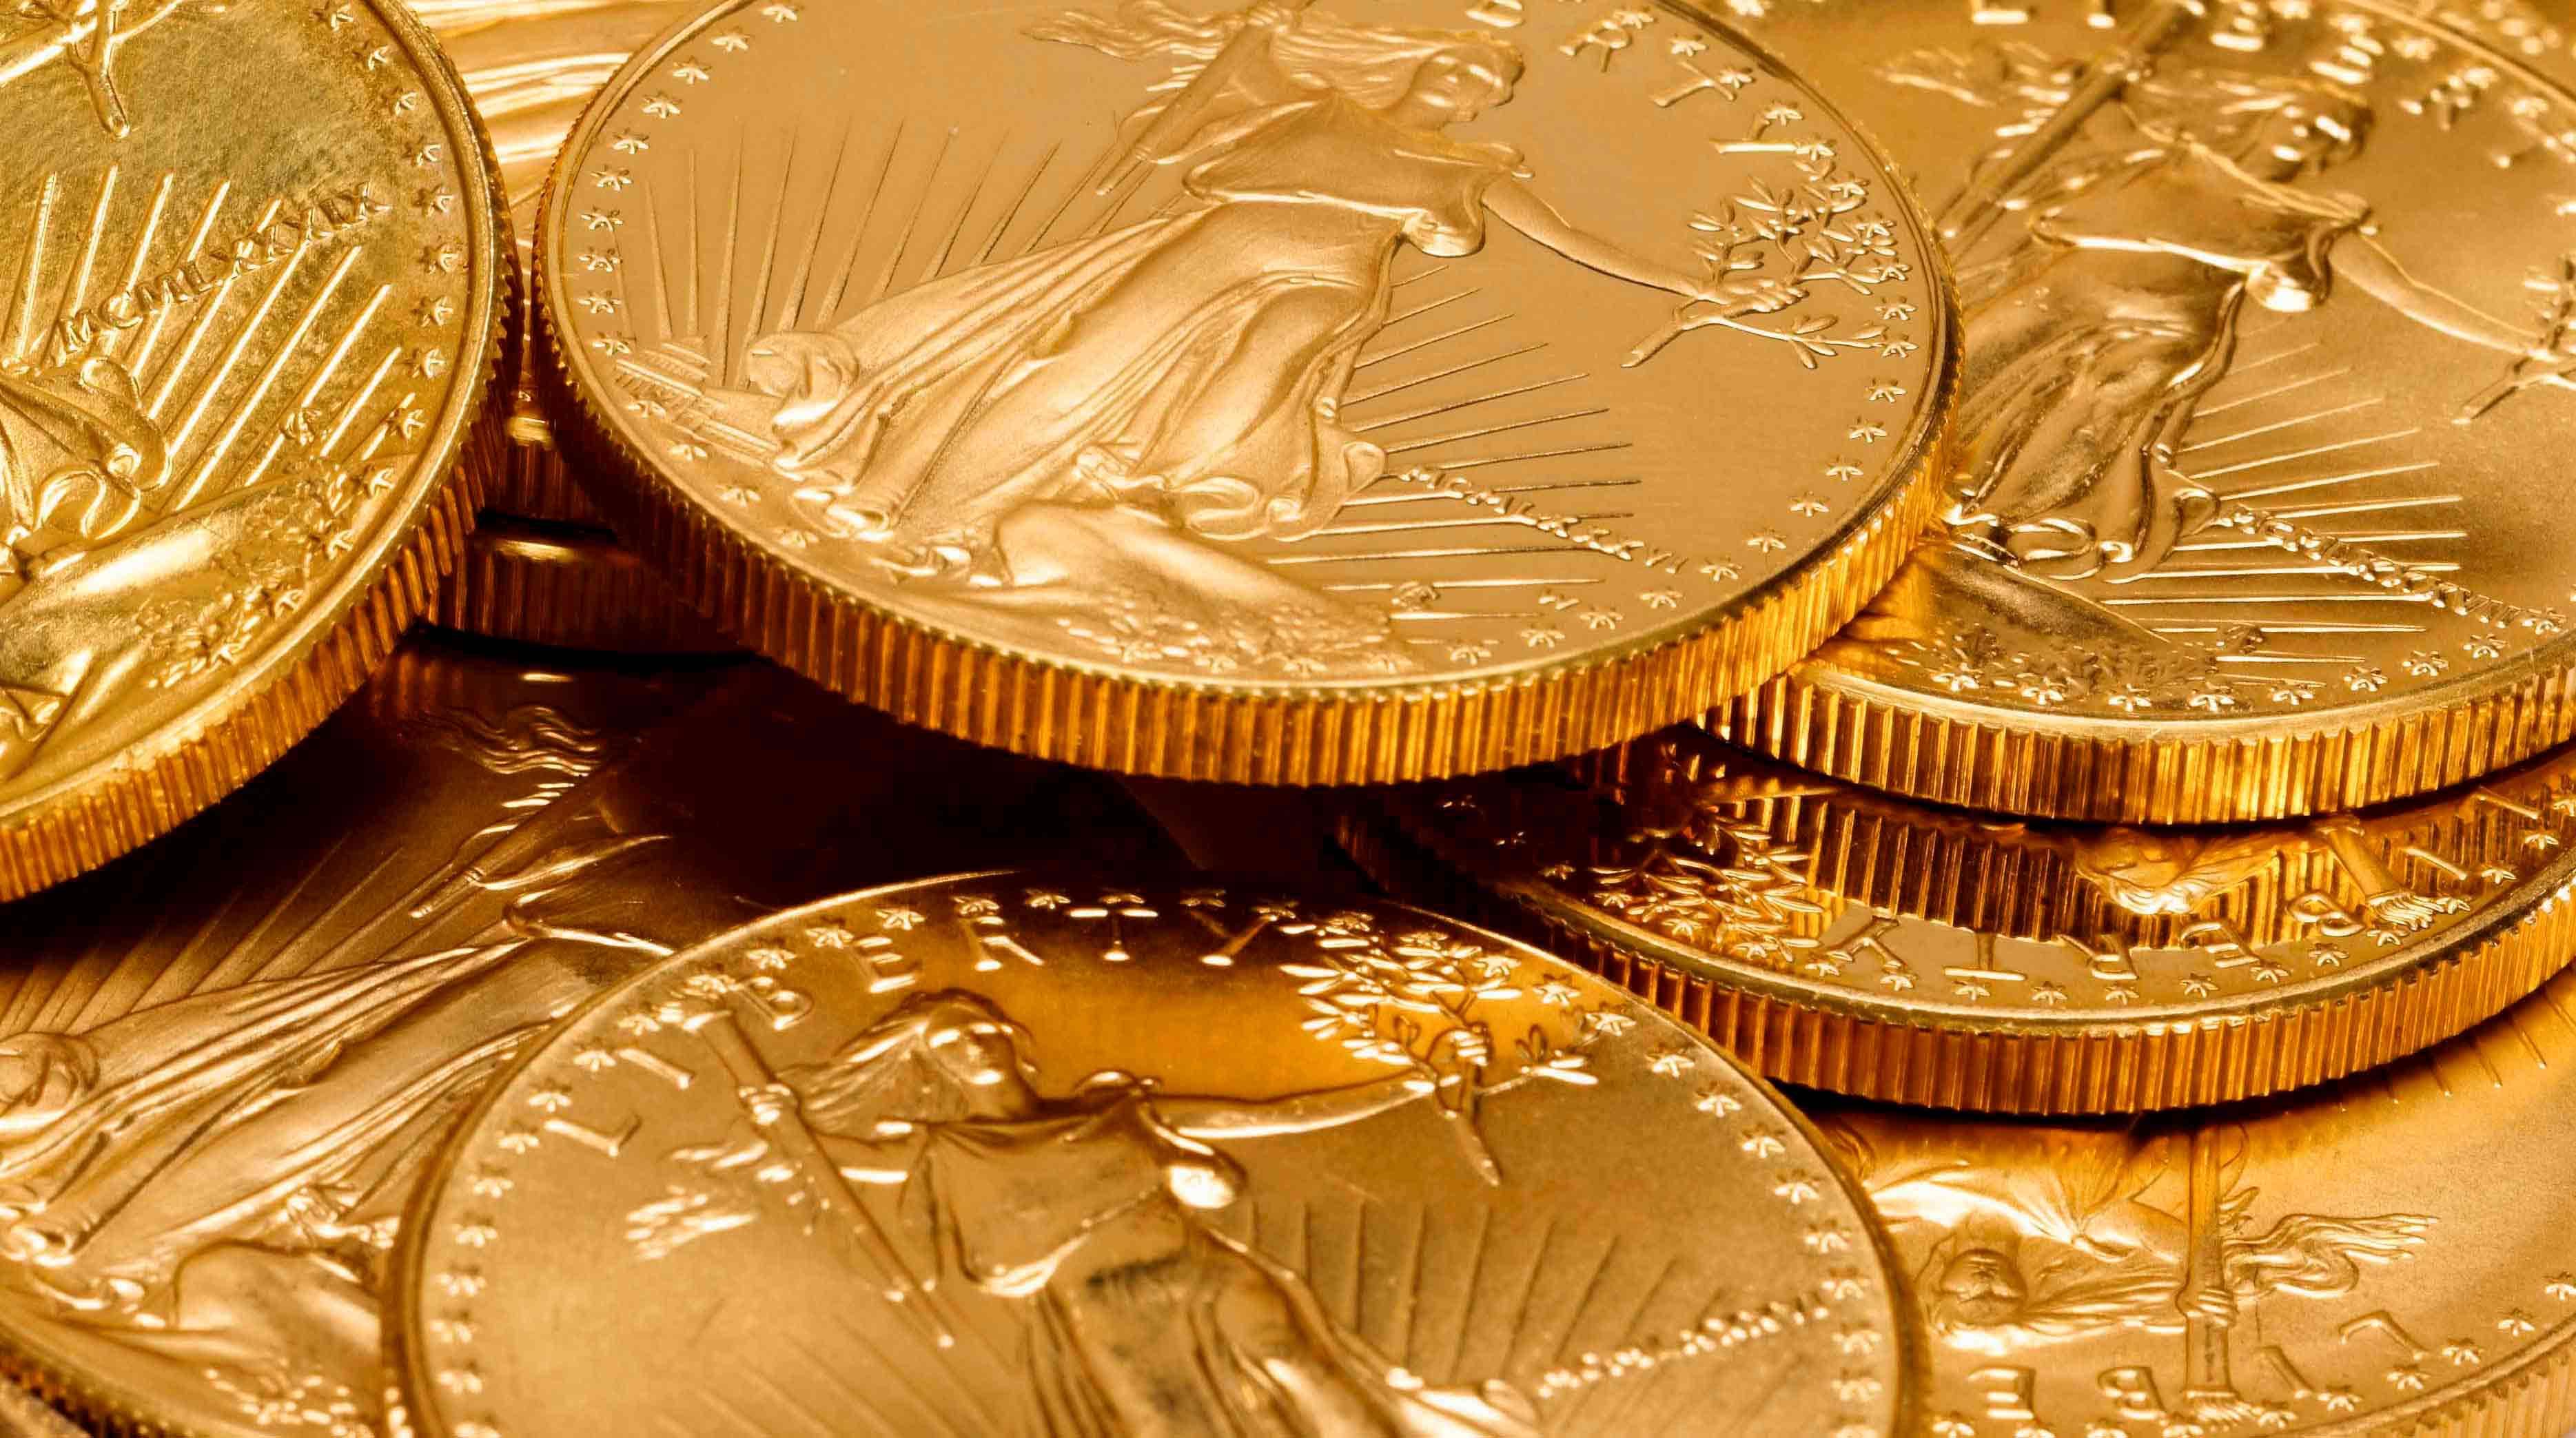 Nettoyer une pièce d'or